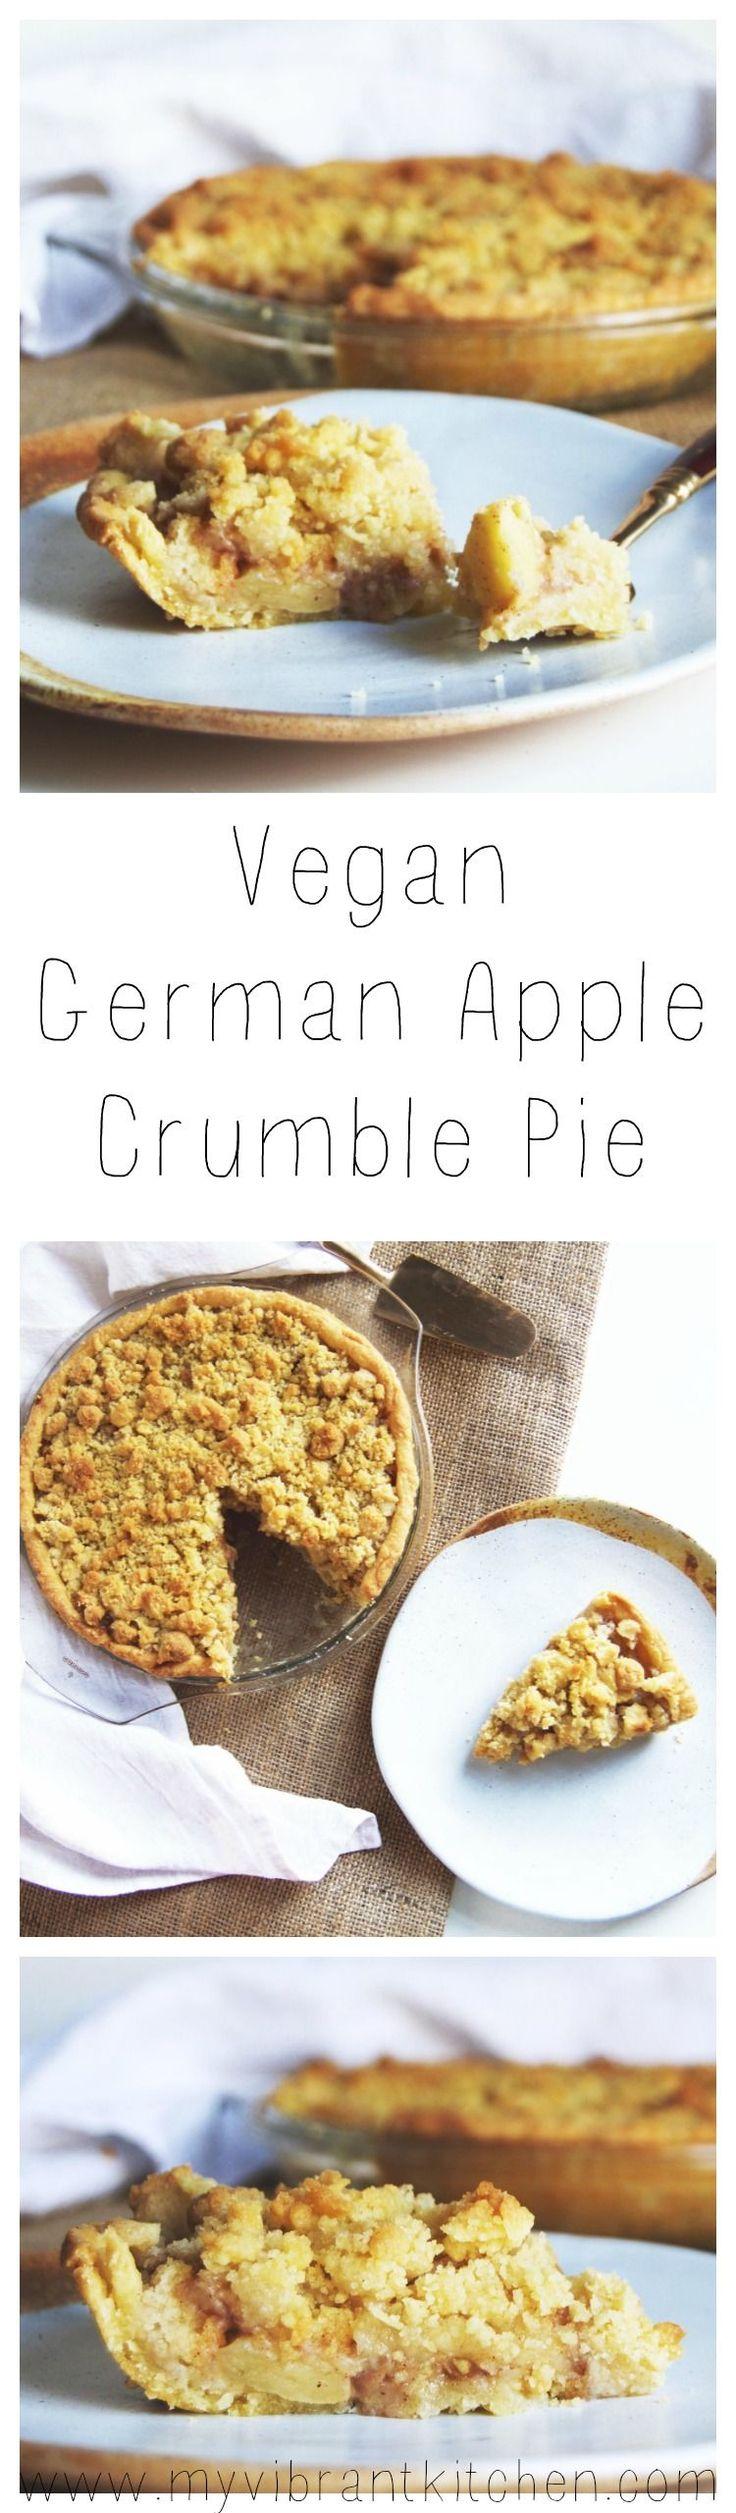 My Vibrant Kitchen   Vegan German Apple Crumble Pie   myvibrantkitchen.com